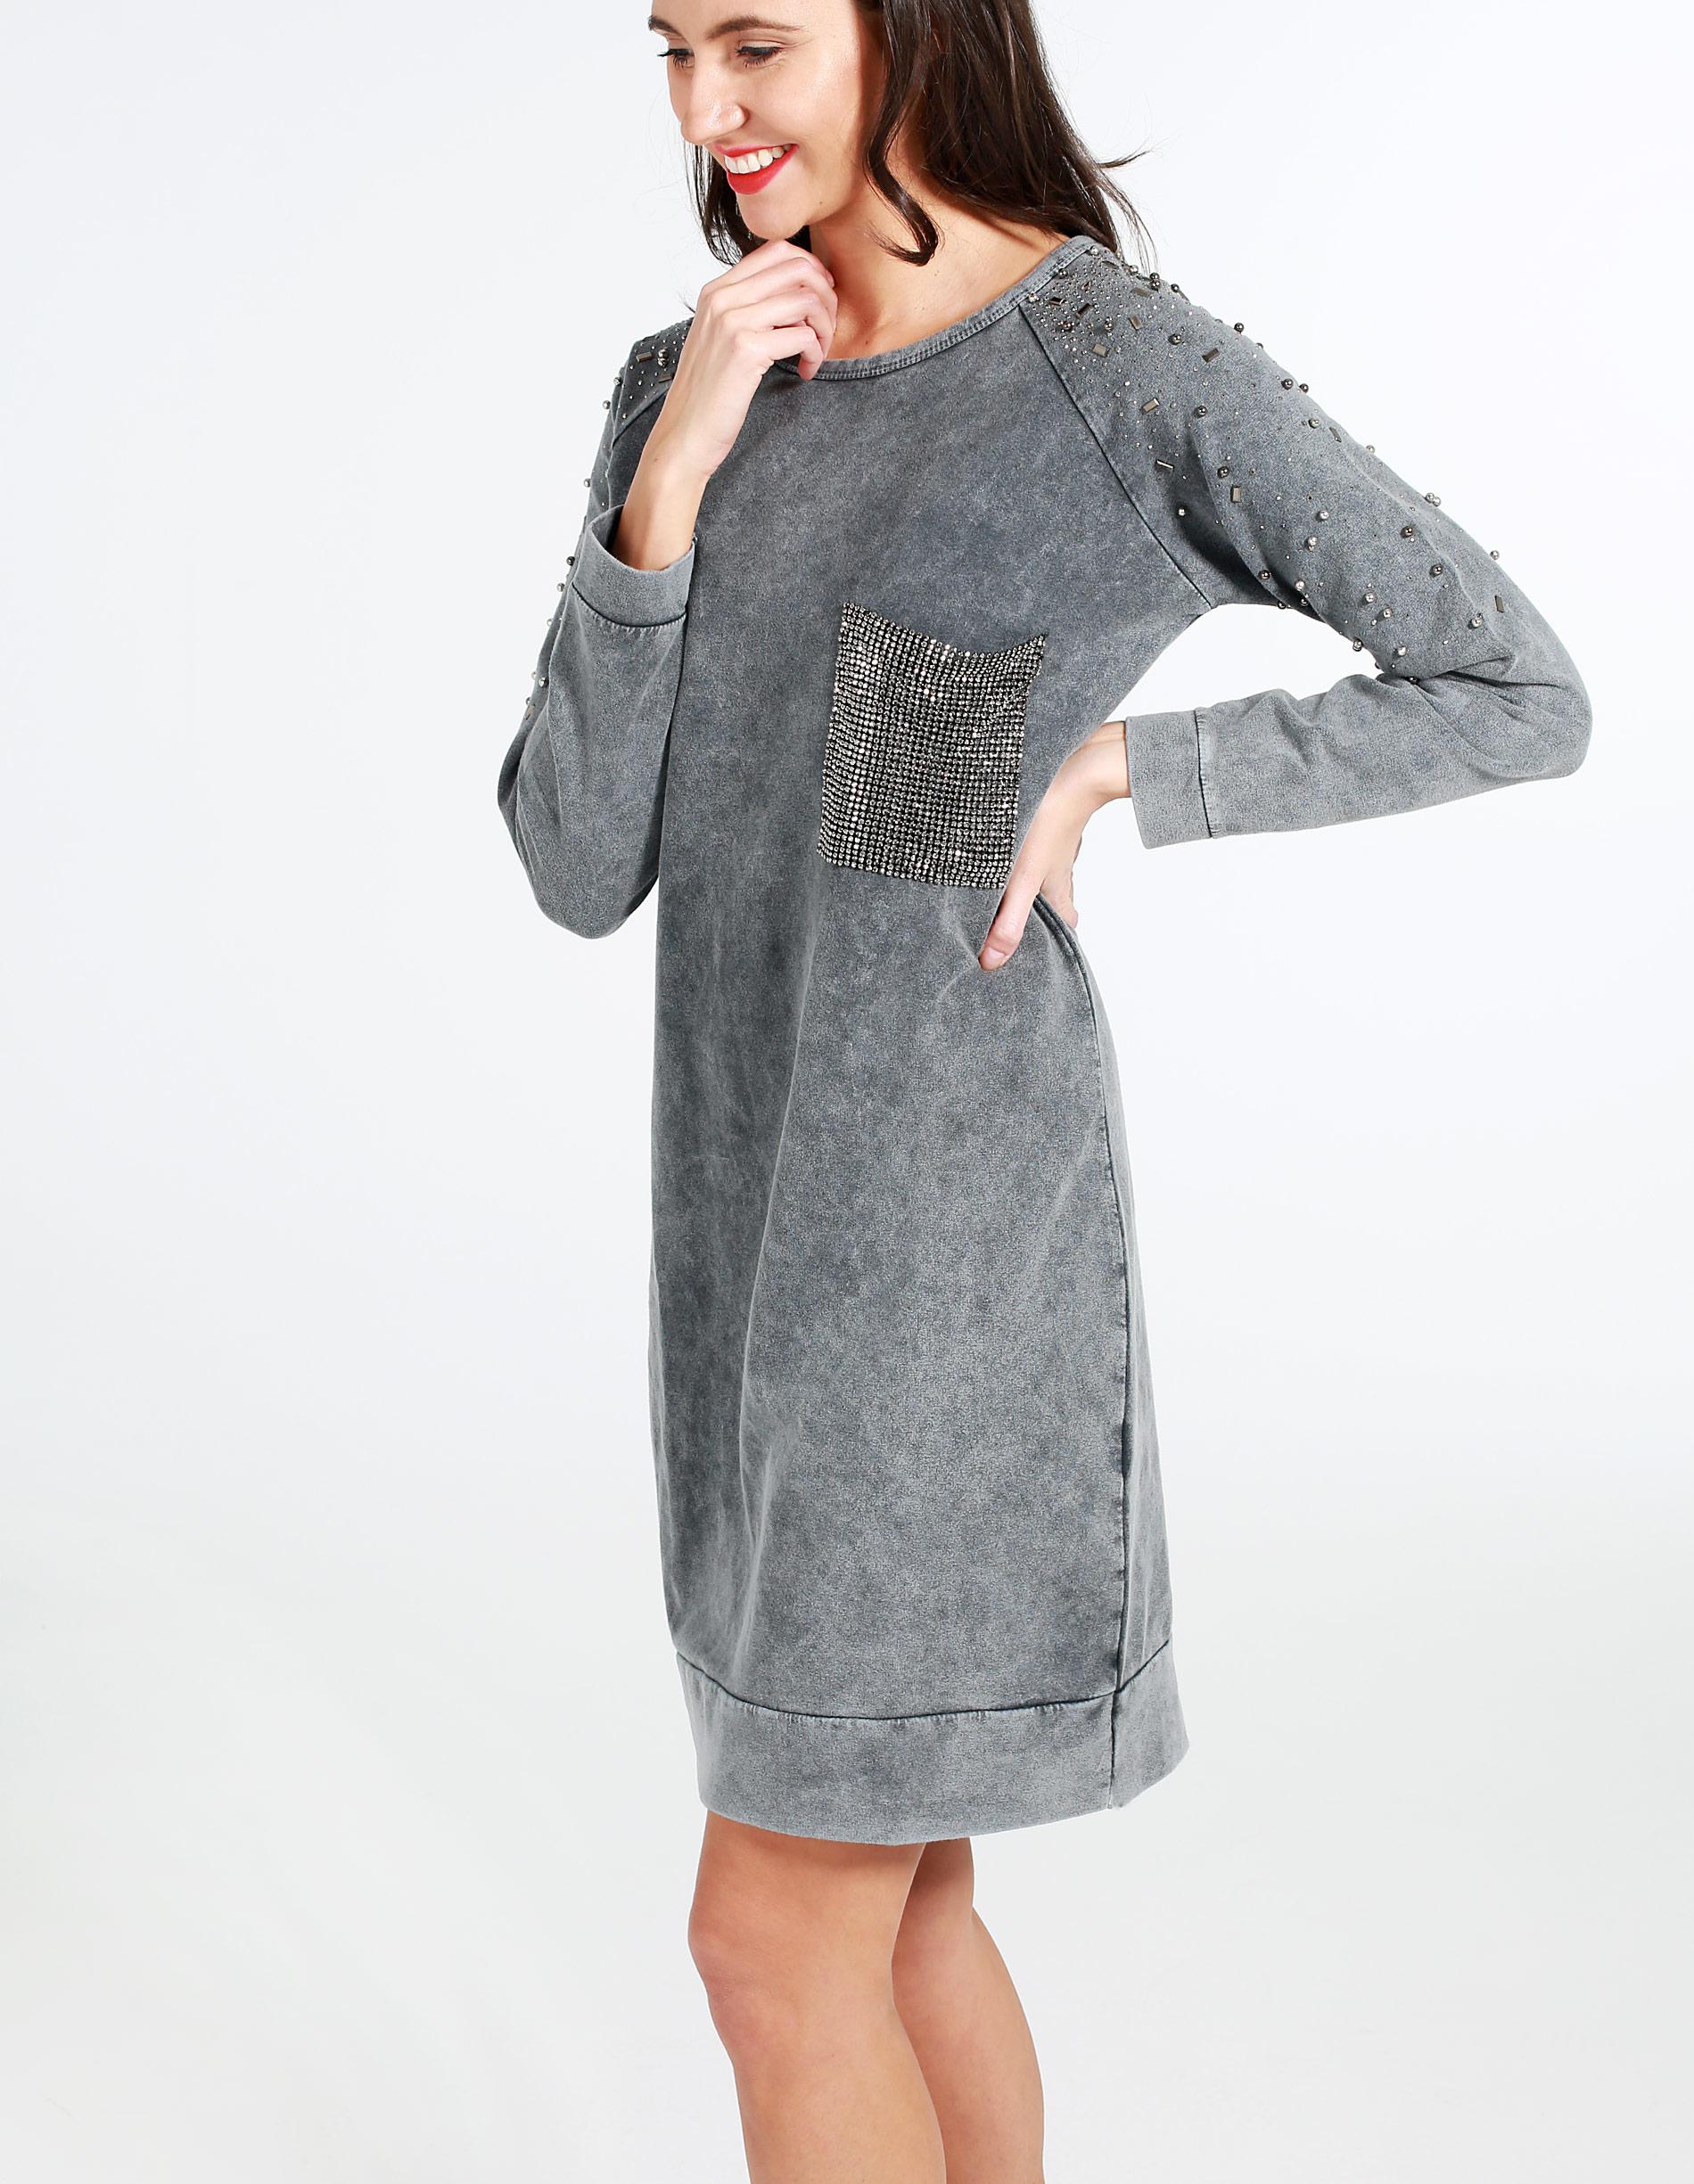 Sukienka - 4-8959 GREY - Unisono